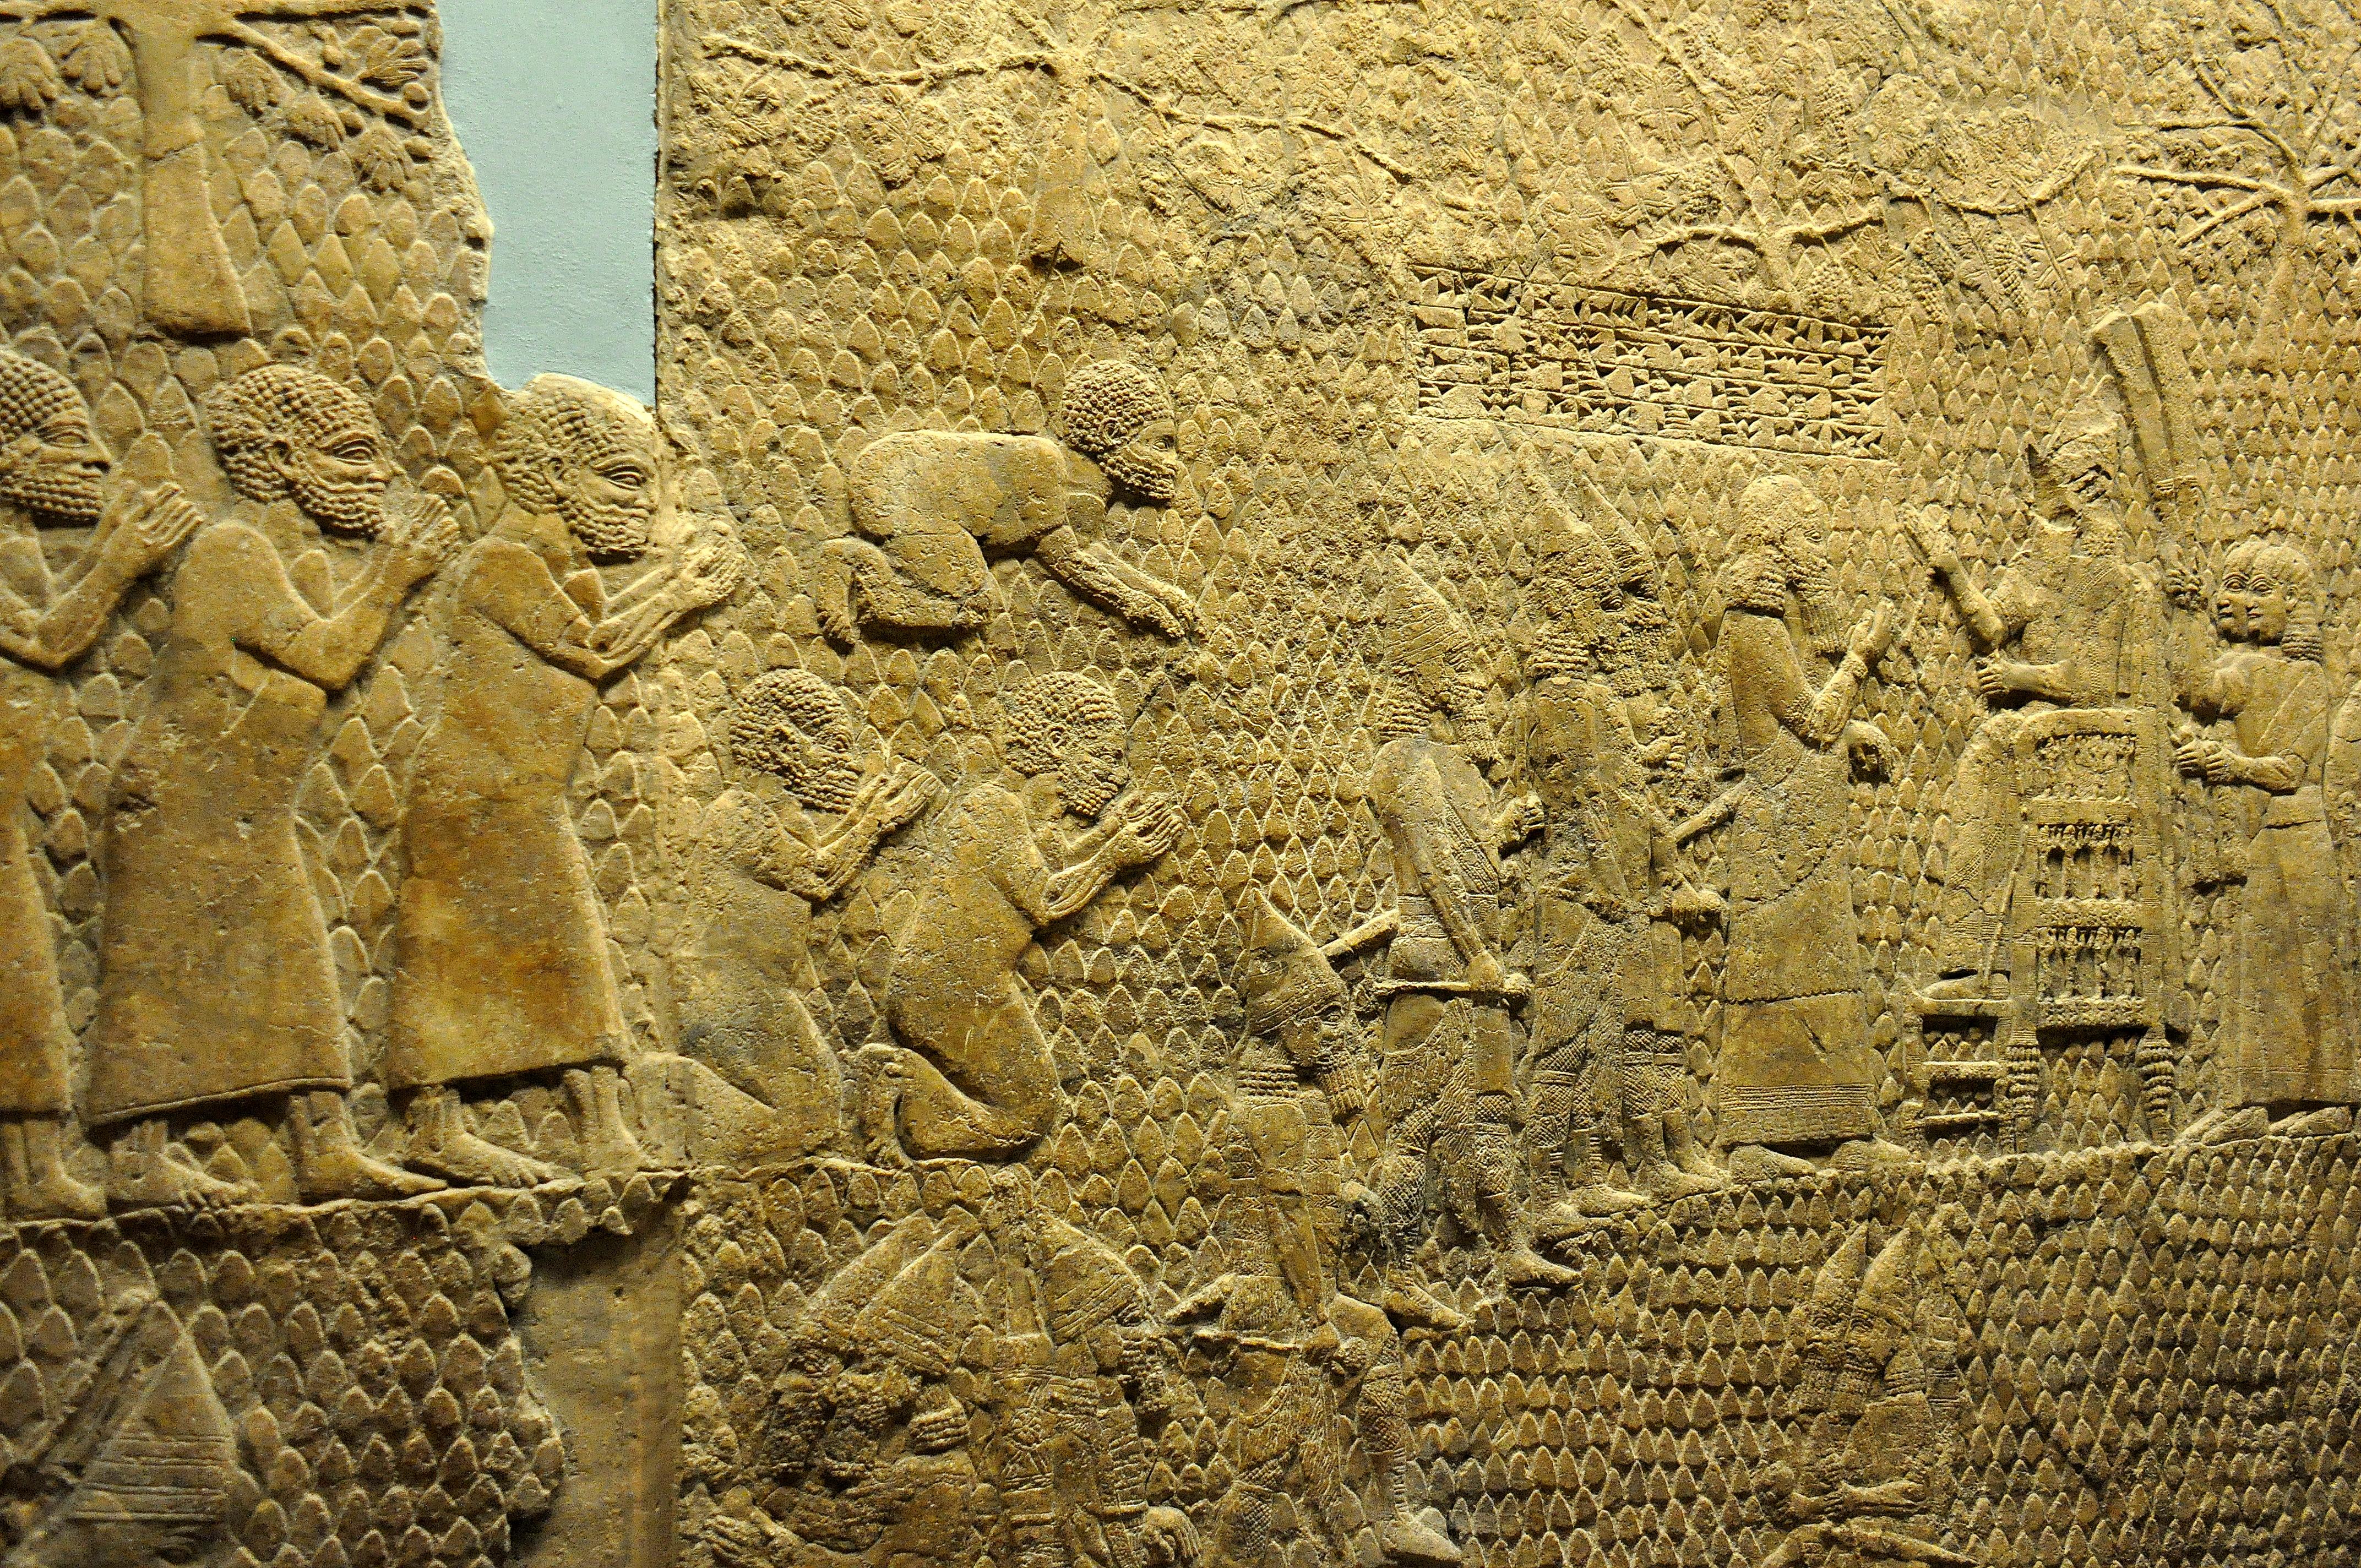 King Sennacherib Backgrounds, Compatible - PC, Mobile, Gadgets  4288x2848 px